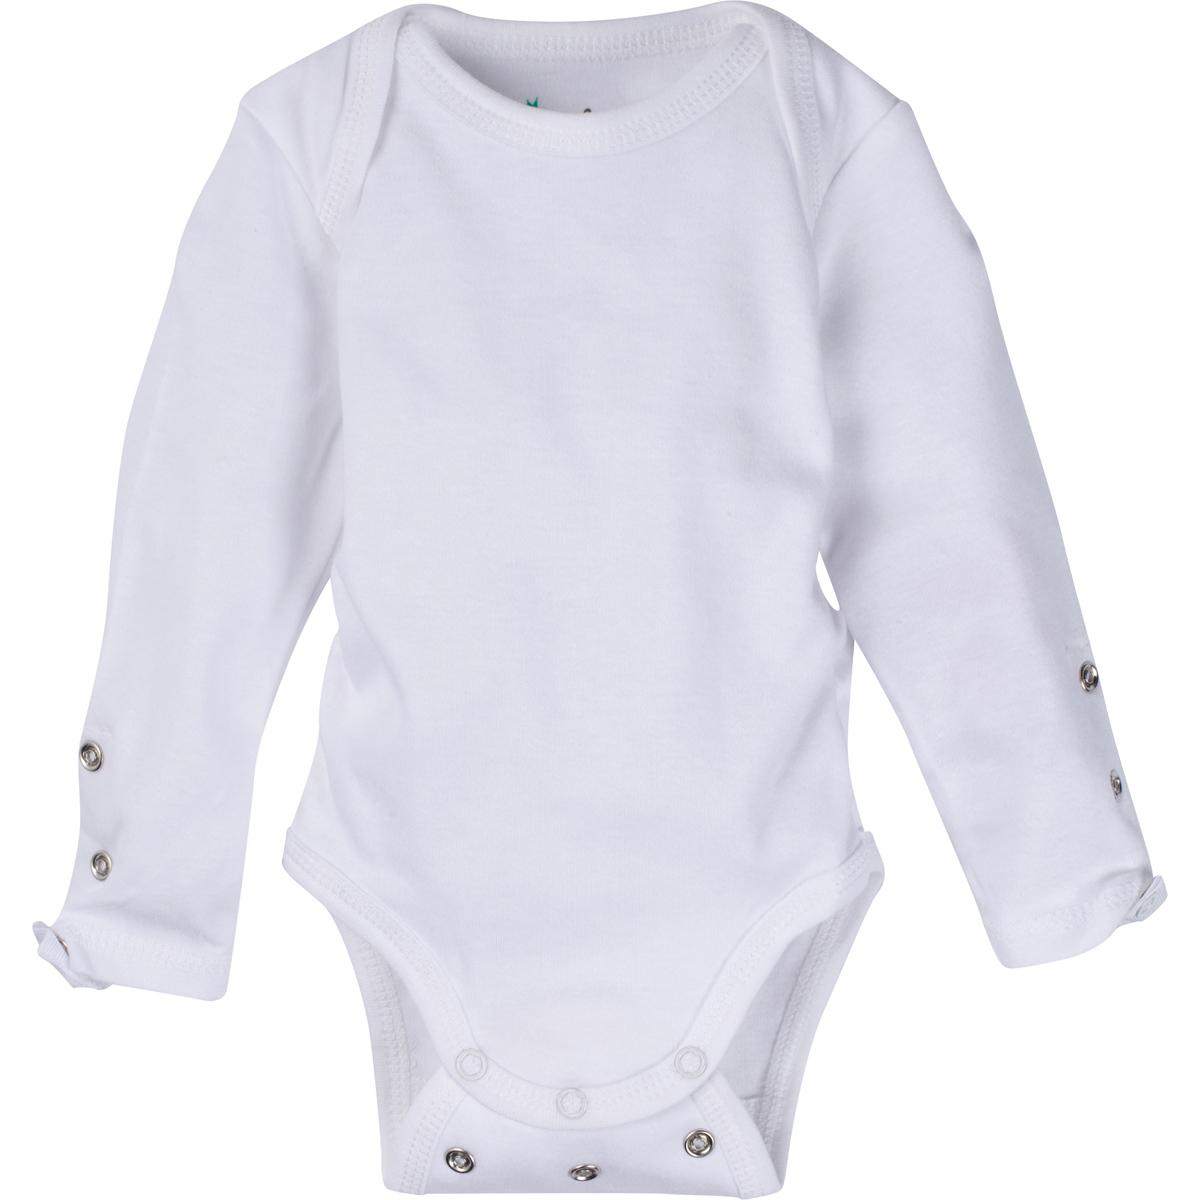 Solid White Adjustable Bodysuit Long-Sleeve